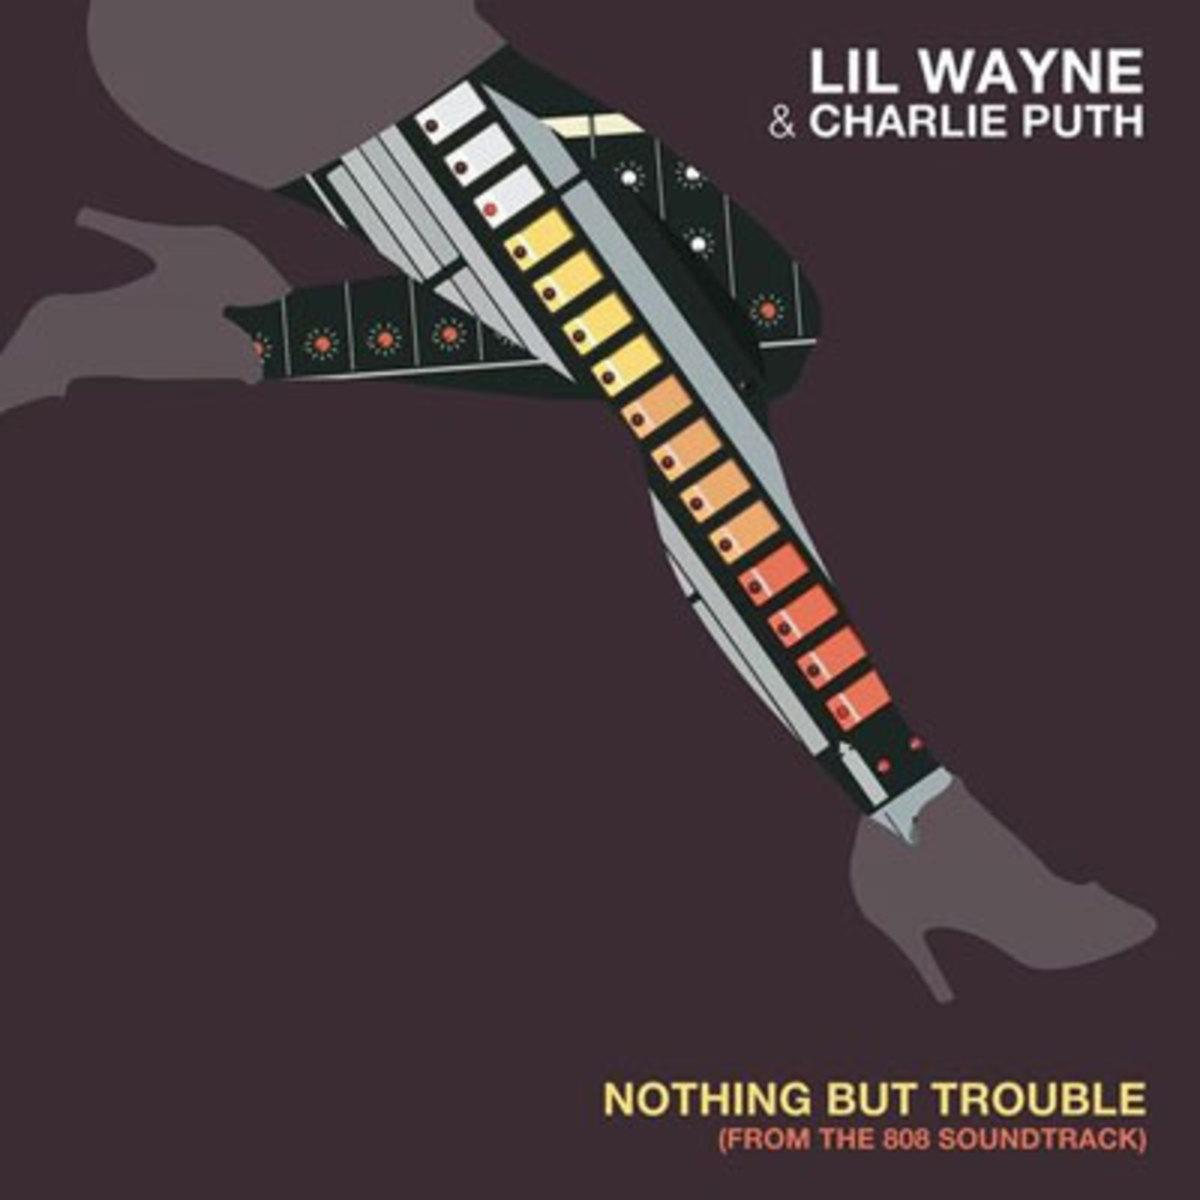 lil-wayne-nothing-but-trouble.jpg